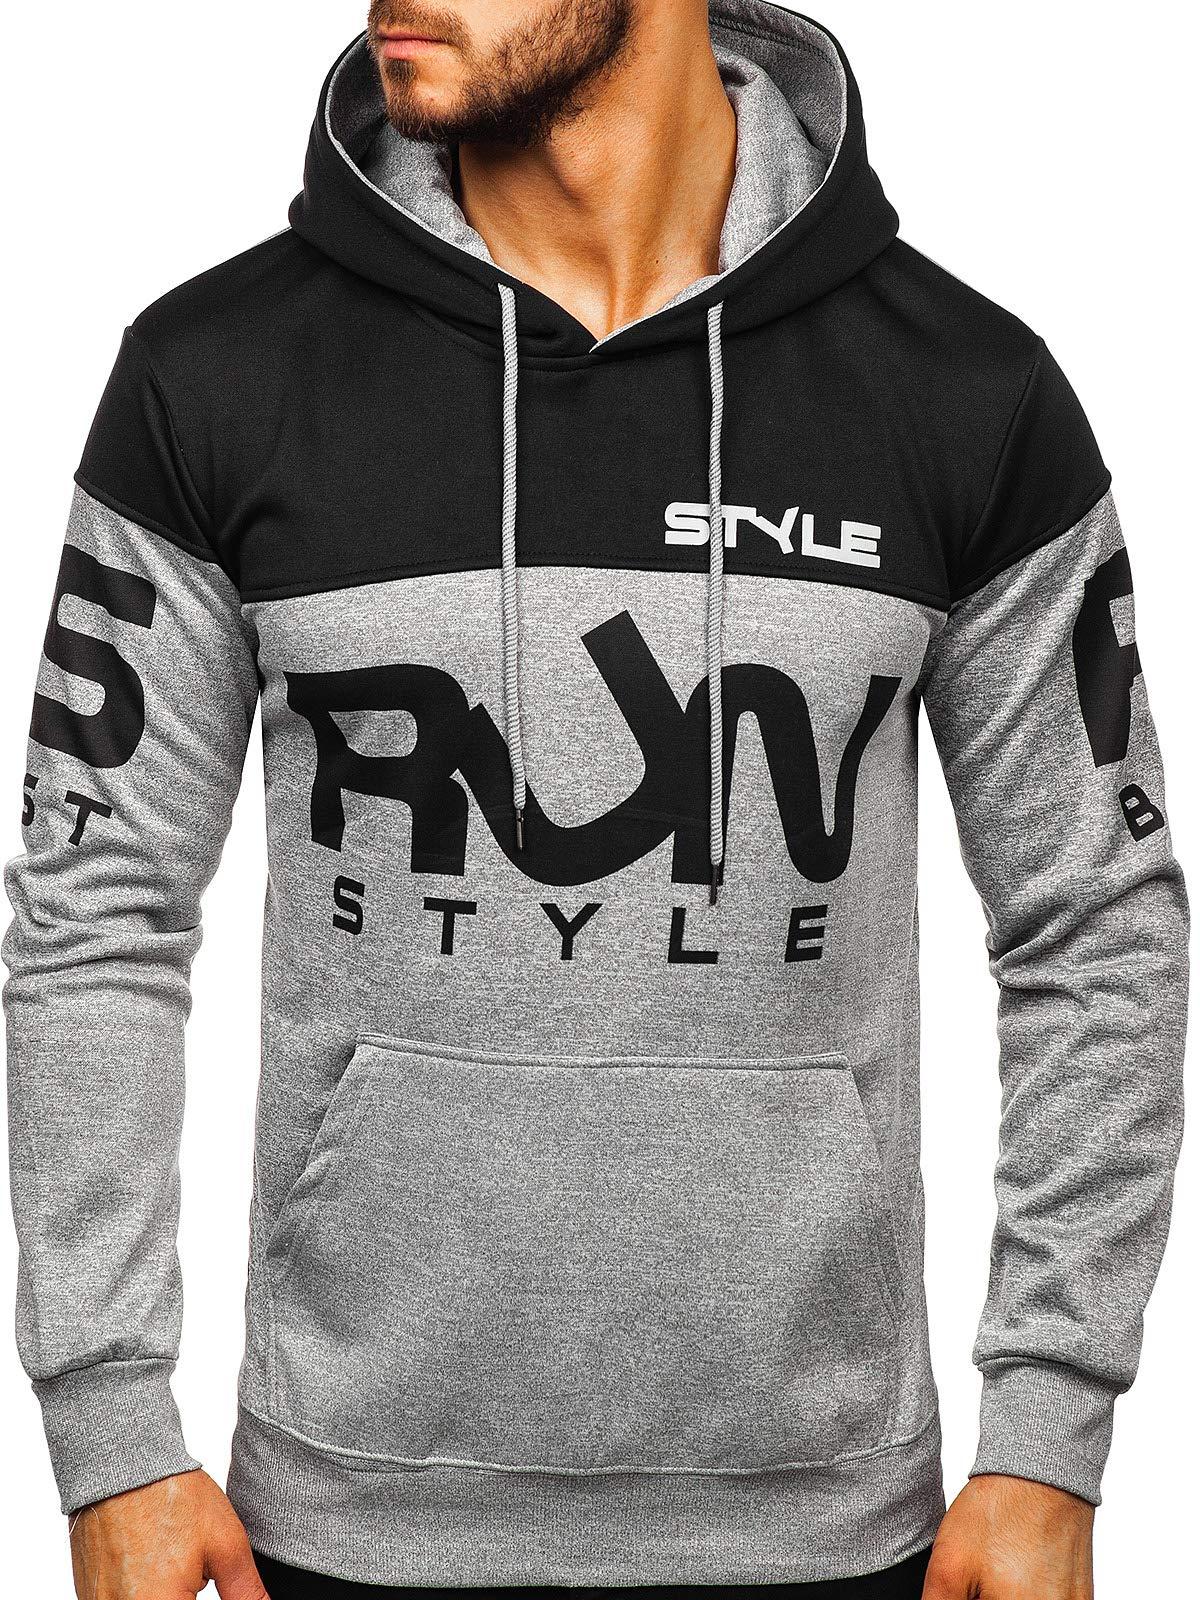 BOLF Mens Hoodies Sweatshirt Hooded Jacket Pullover Sports Jumper 1A1 Graphic